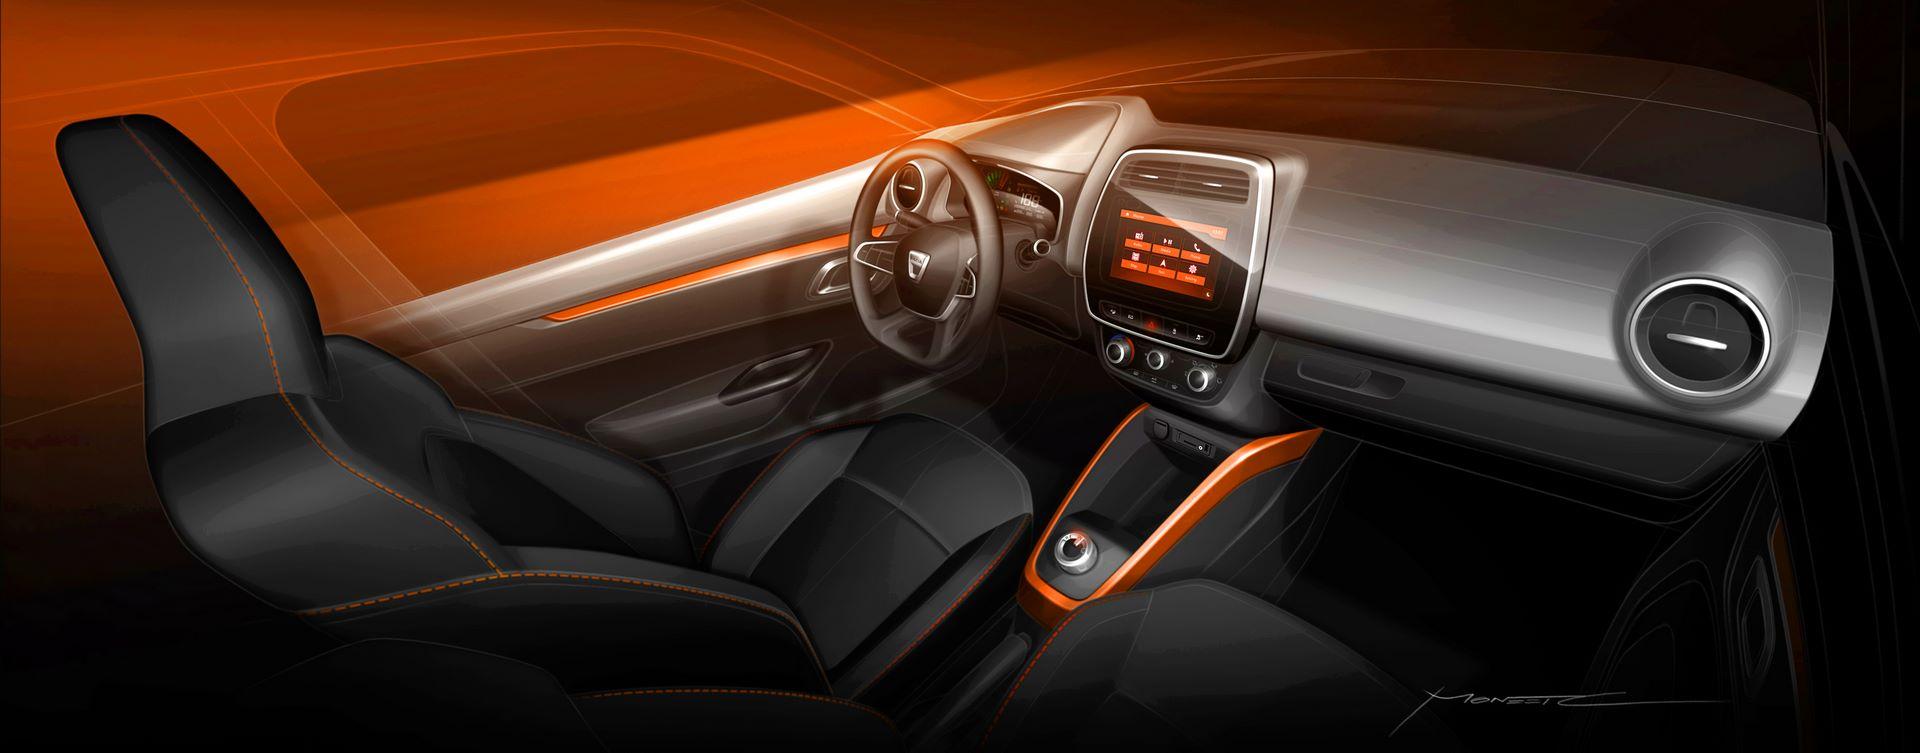 2020-Dacia-SPRING-Design-genesis-2